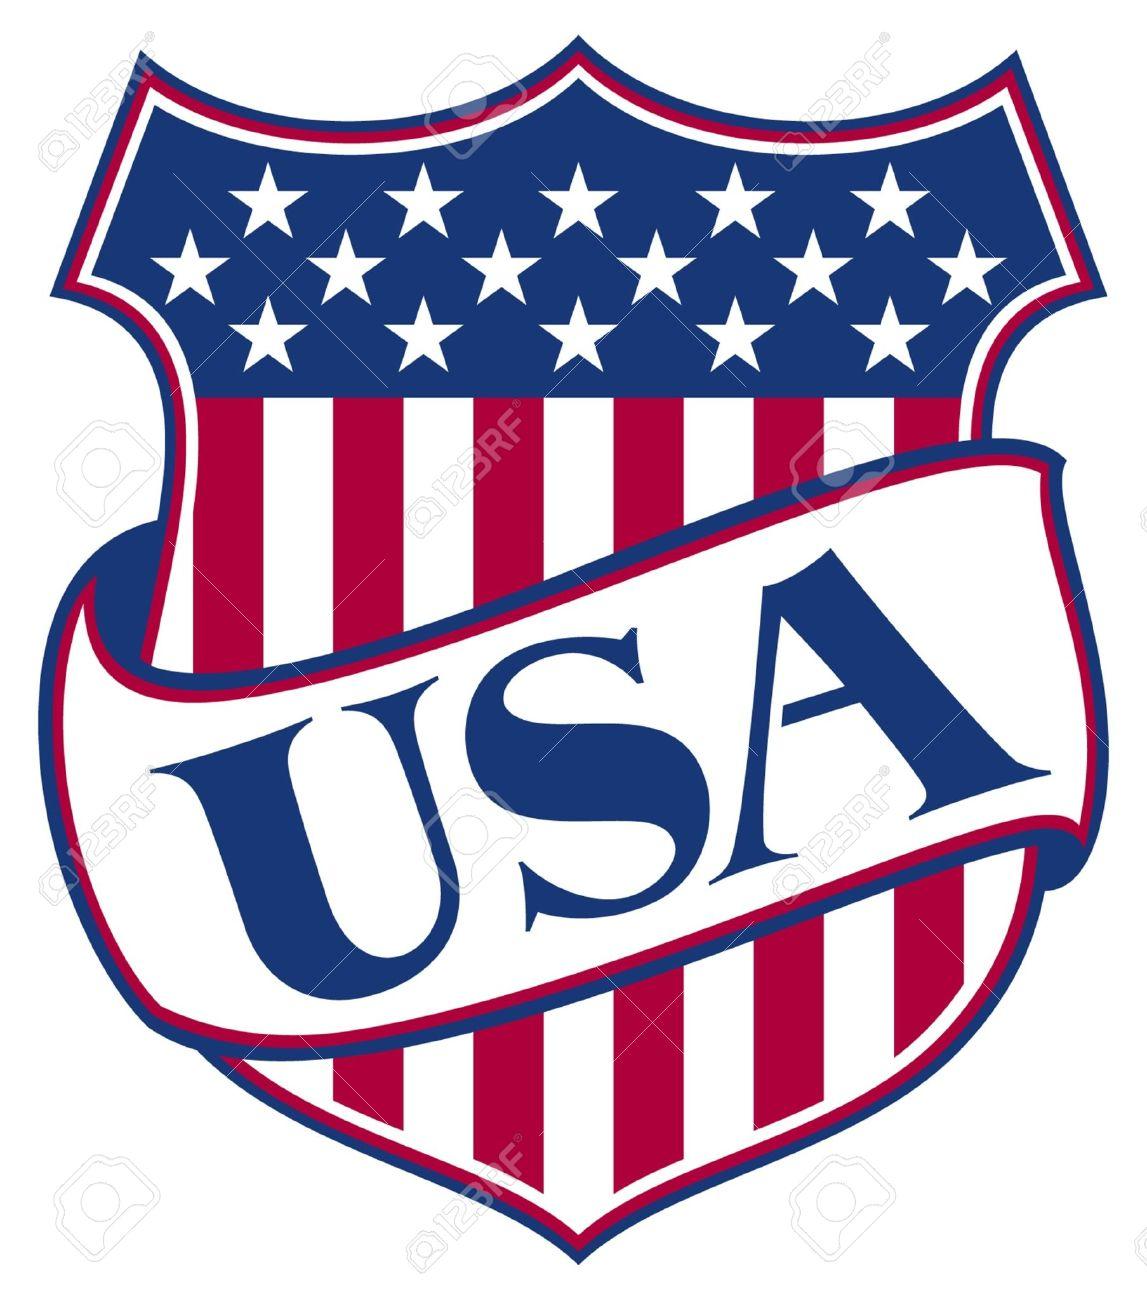 United states of america shield usa american patriotic symbol united states of america shield usa american patriotic symbol stock vector 15099211 buycottarizona Choice Image